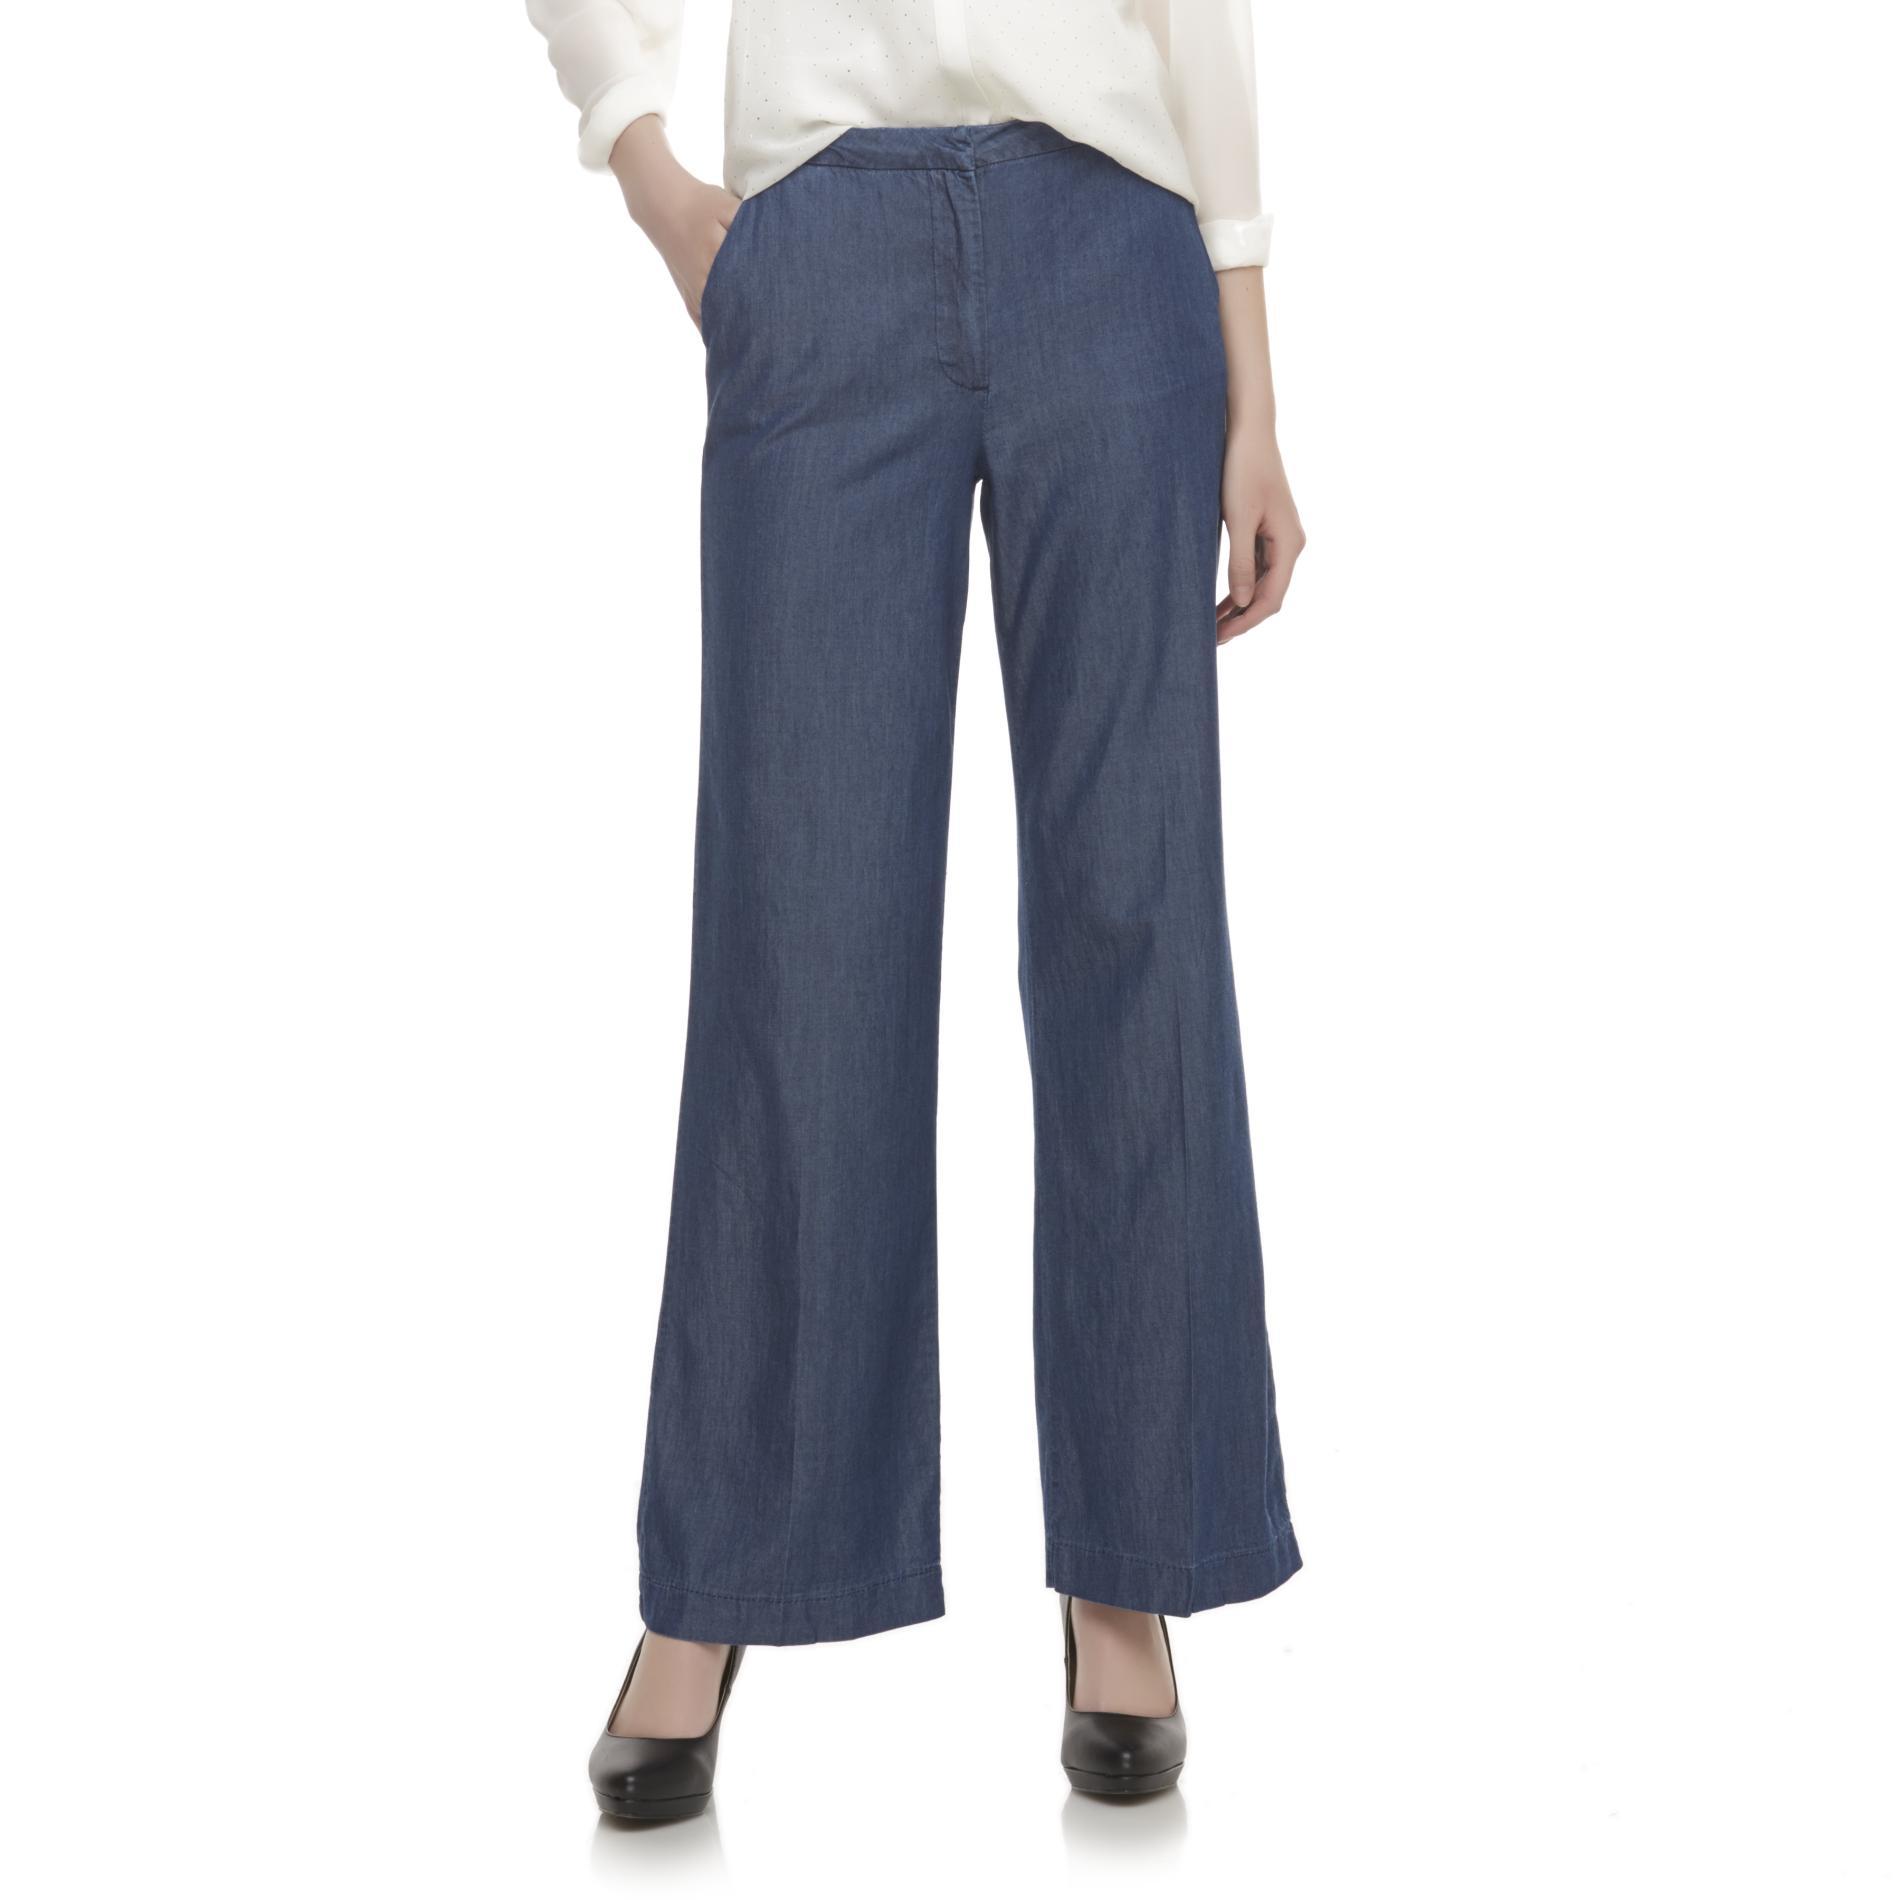 Metaphor Women's Chambray Dress Pants